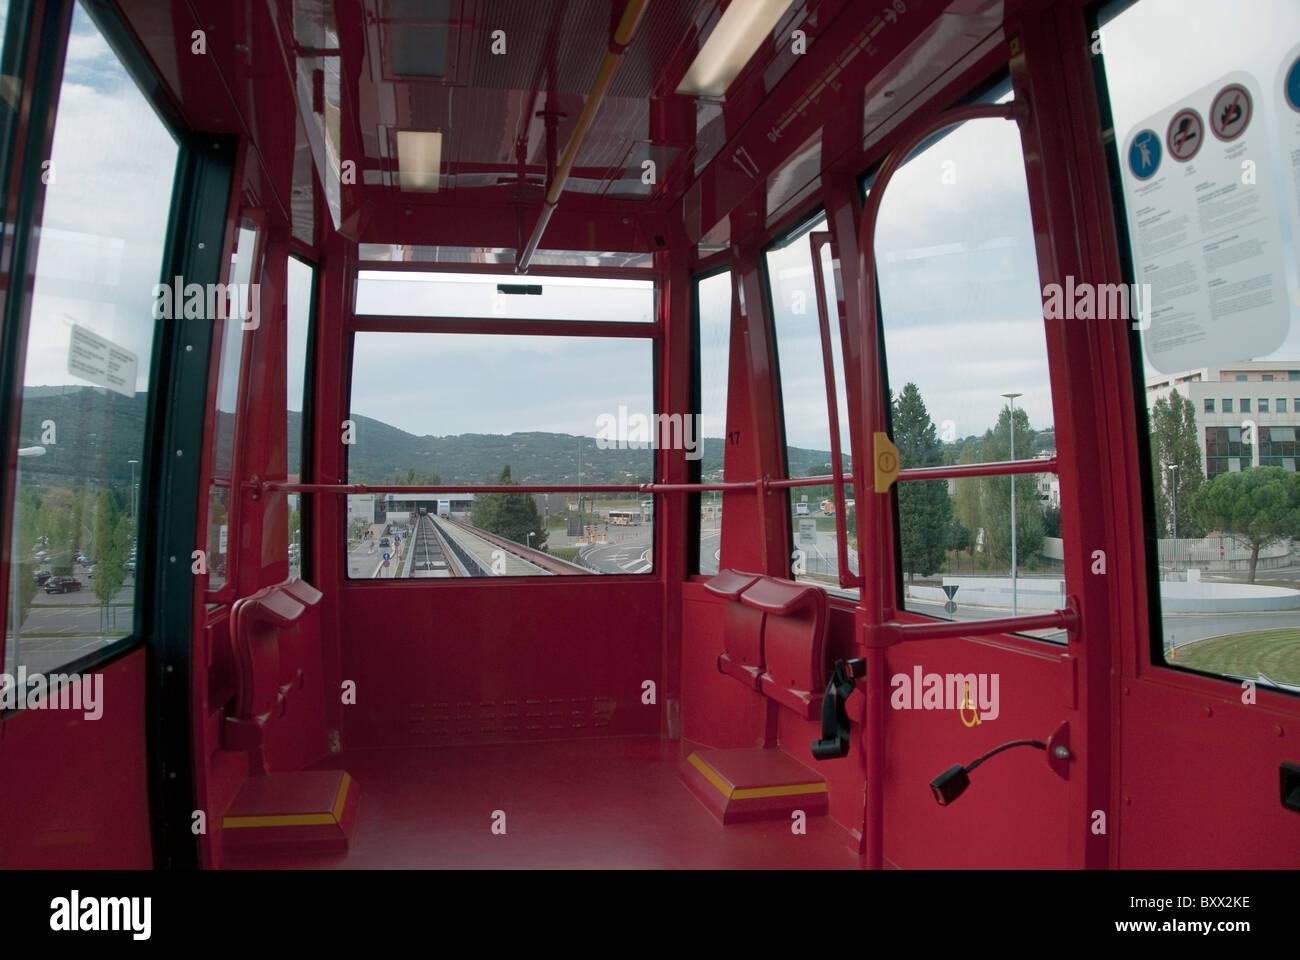 Mini Kühlschrank Metro : Mini train stockfotos & mini train bilder seite 2 alamy